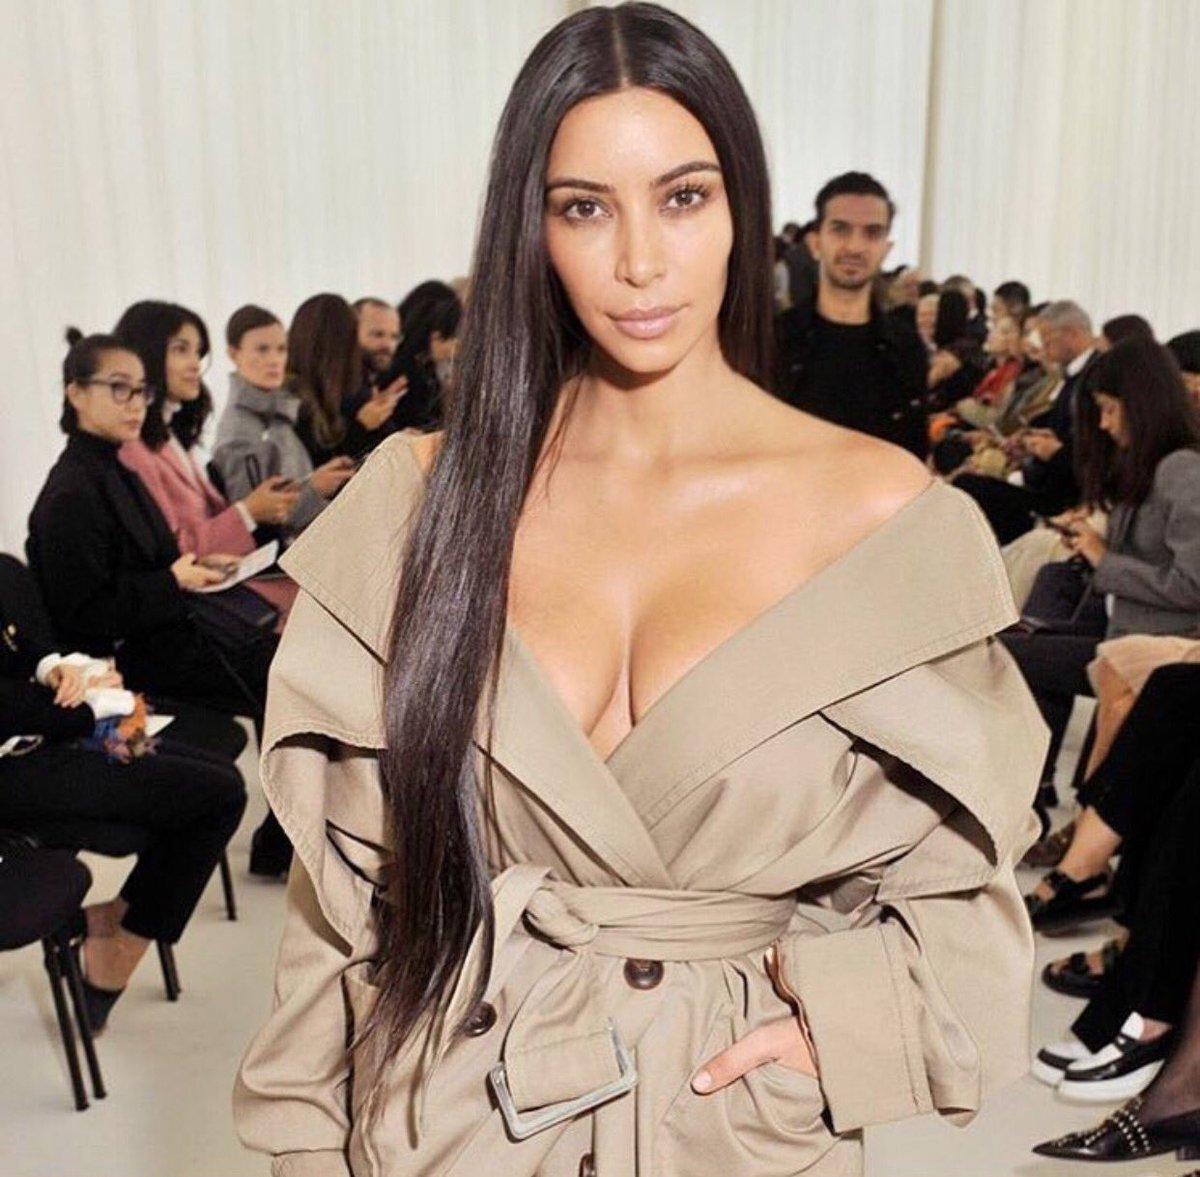 The Russian model went to Hollywood to overshadow Kim Kardashian